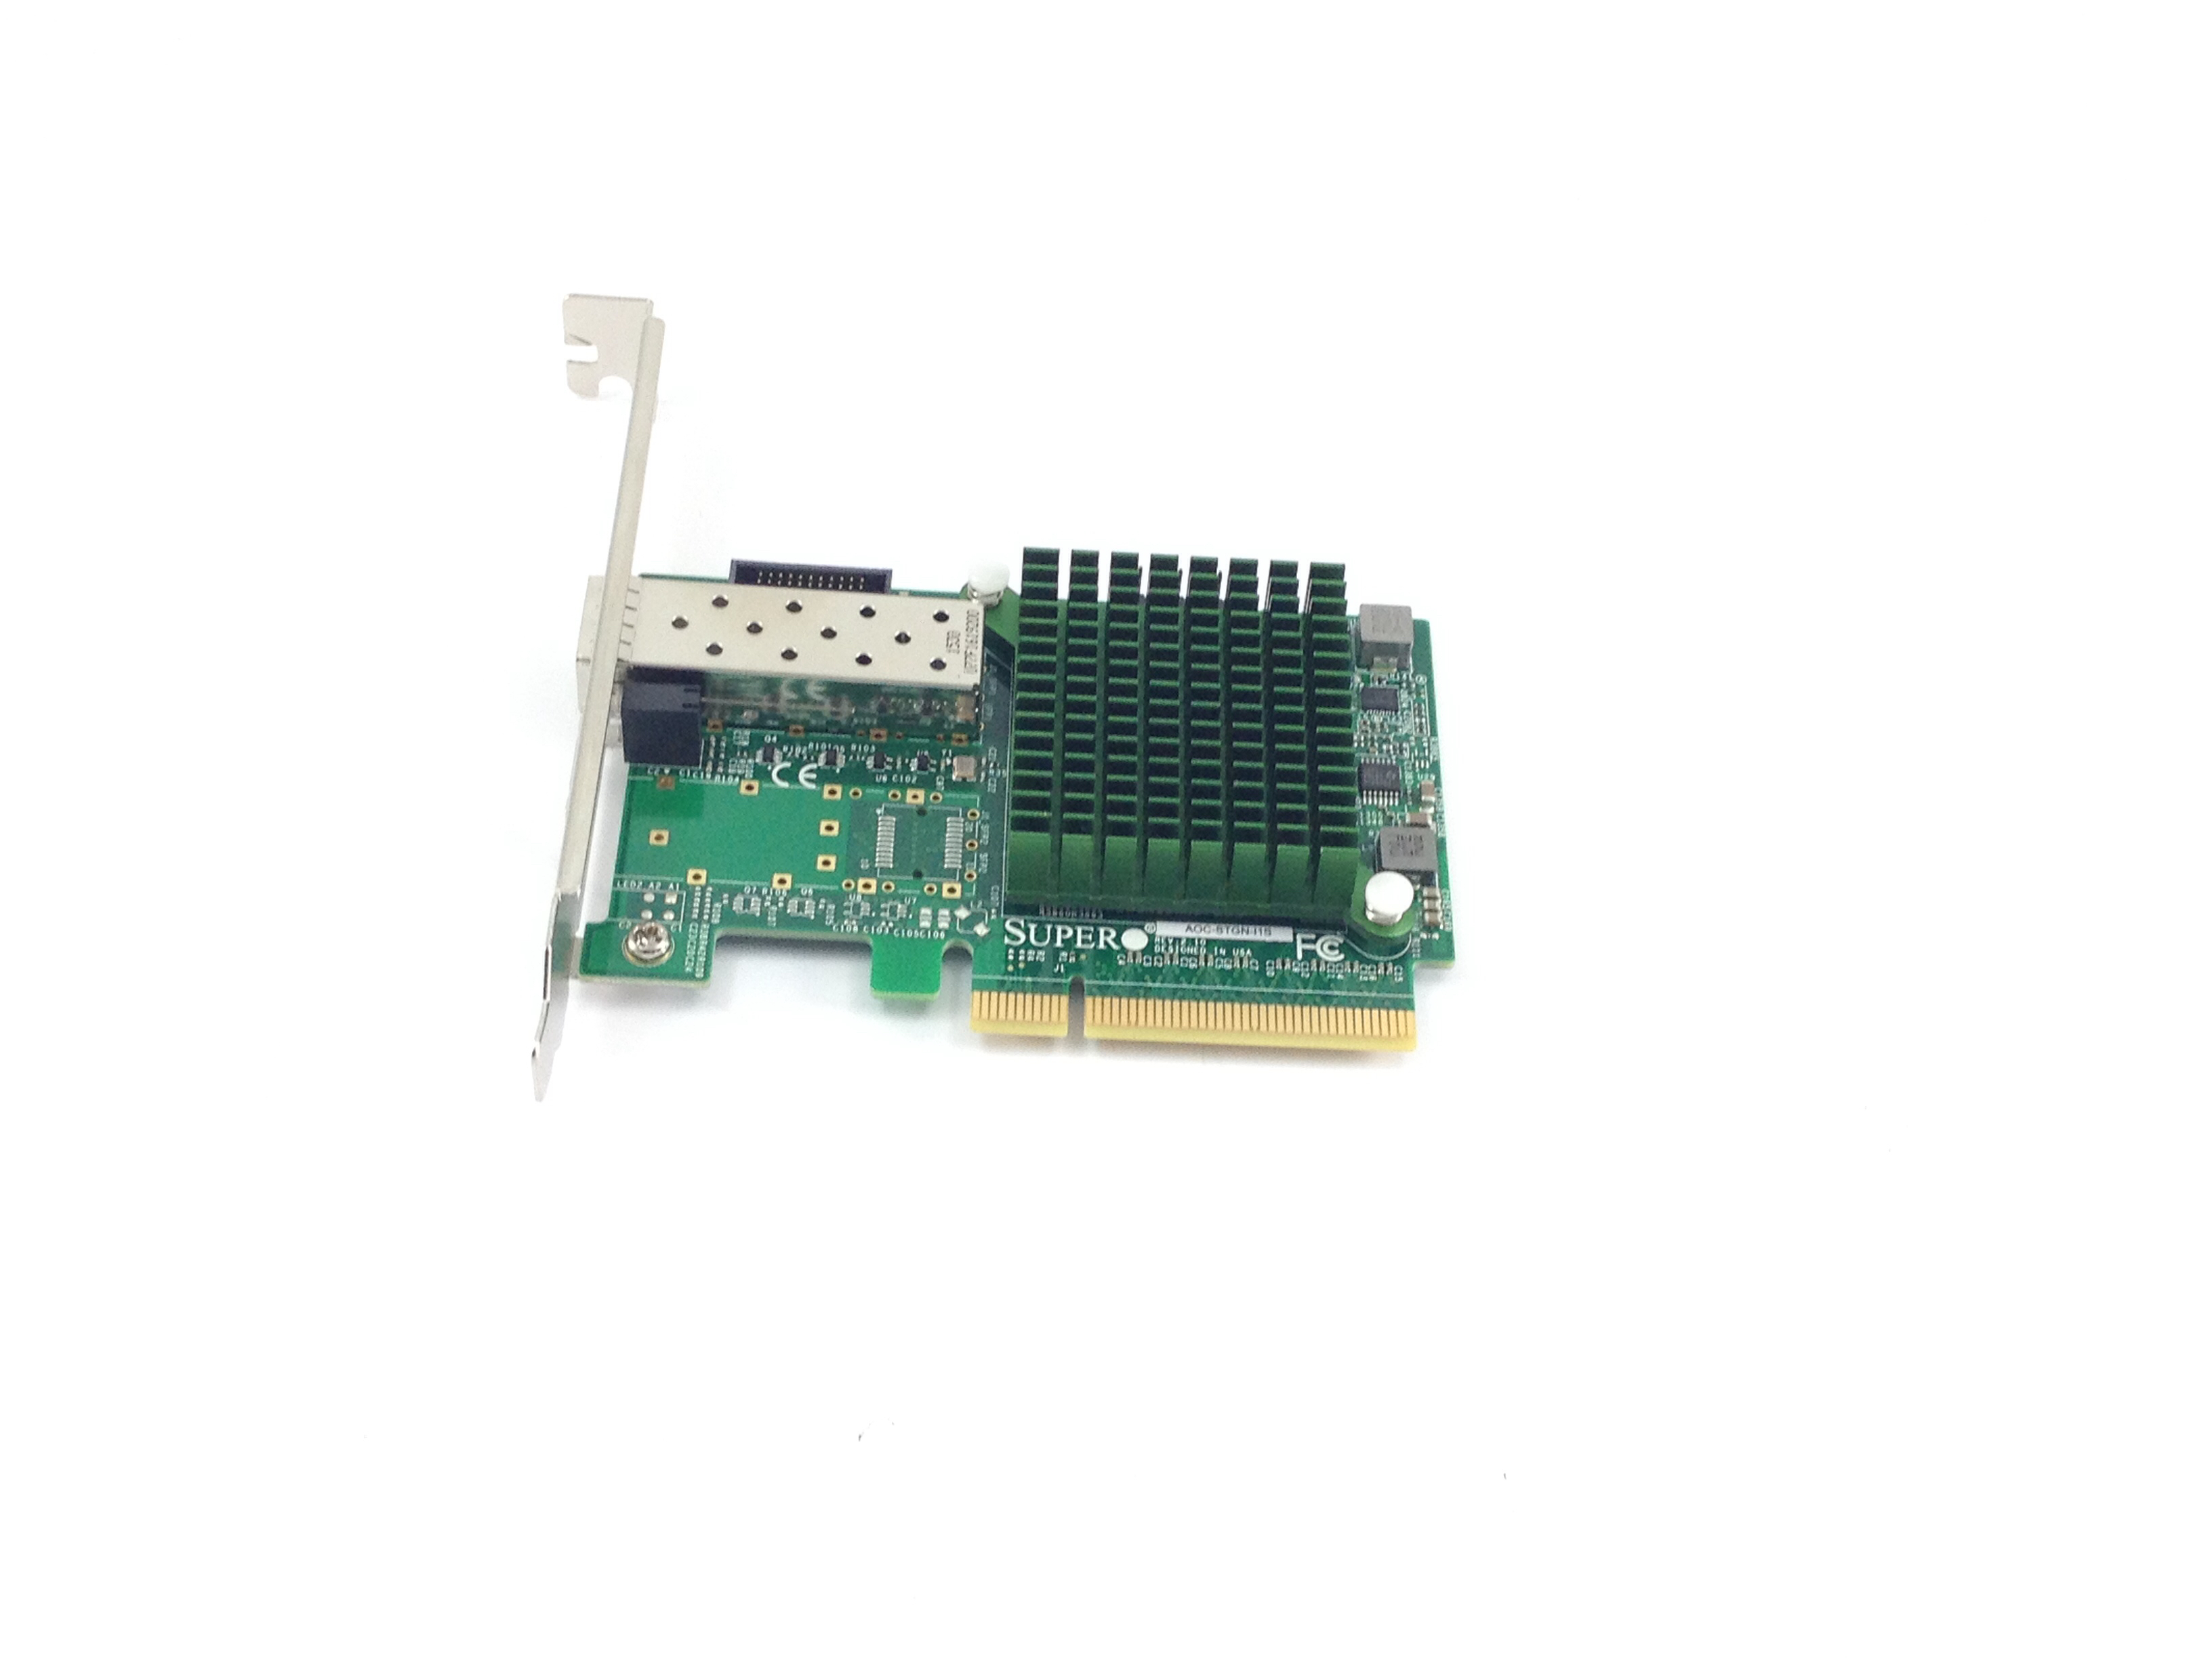 Supermicro  Single-Port 10 Gigabit Ethernet Adapter (AOC-STGN-I1S)